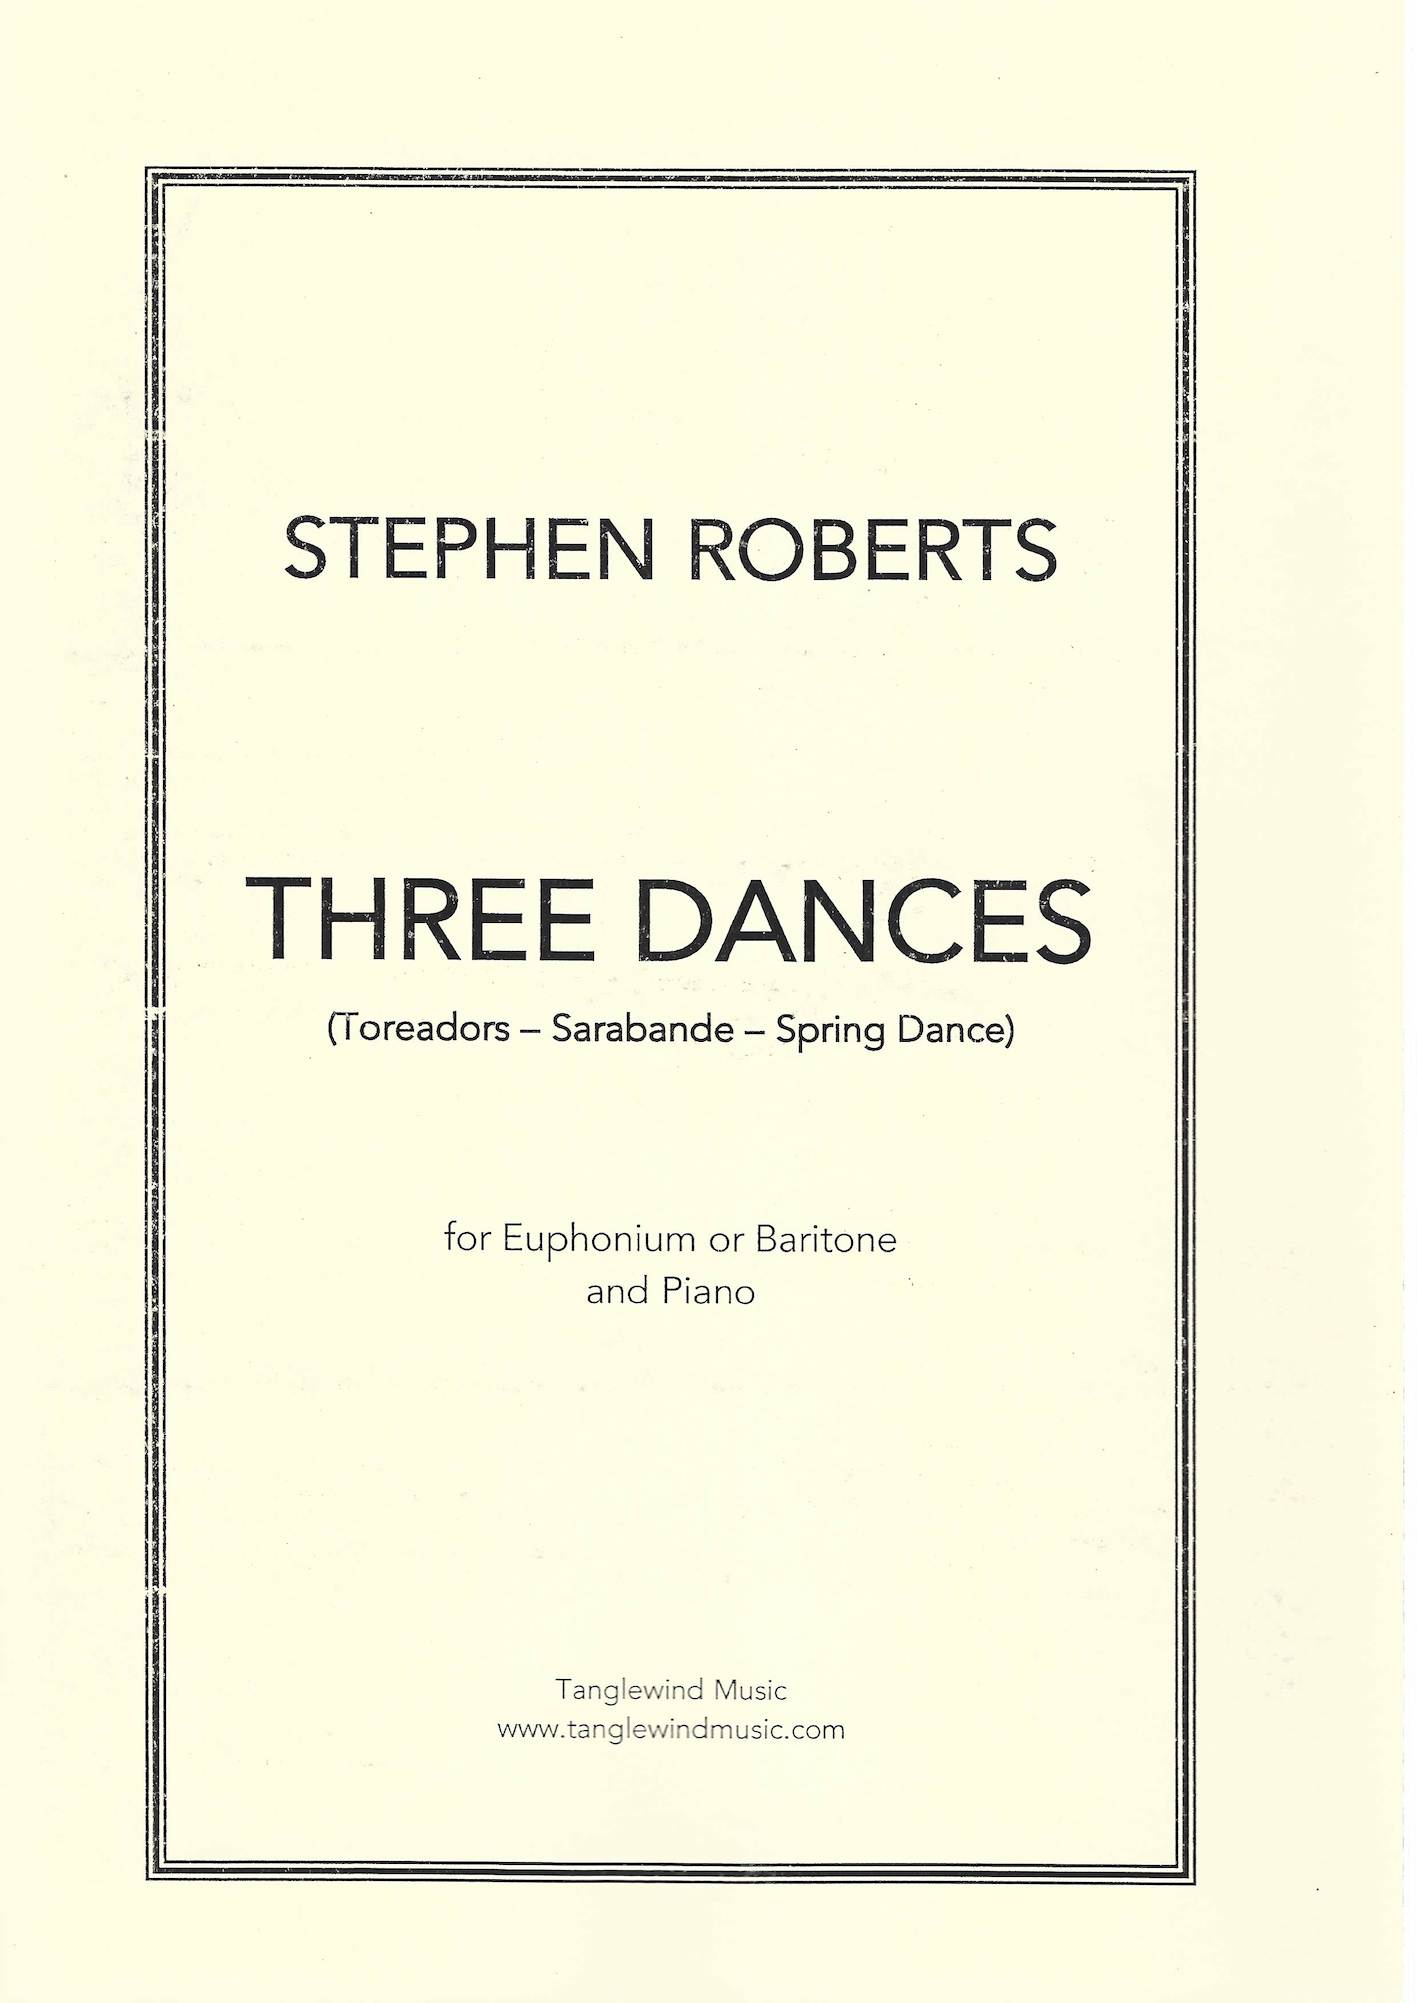 Three Dances - Stephen Roberts - Euphonium or Baritone and Piano